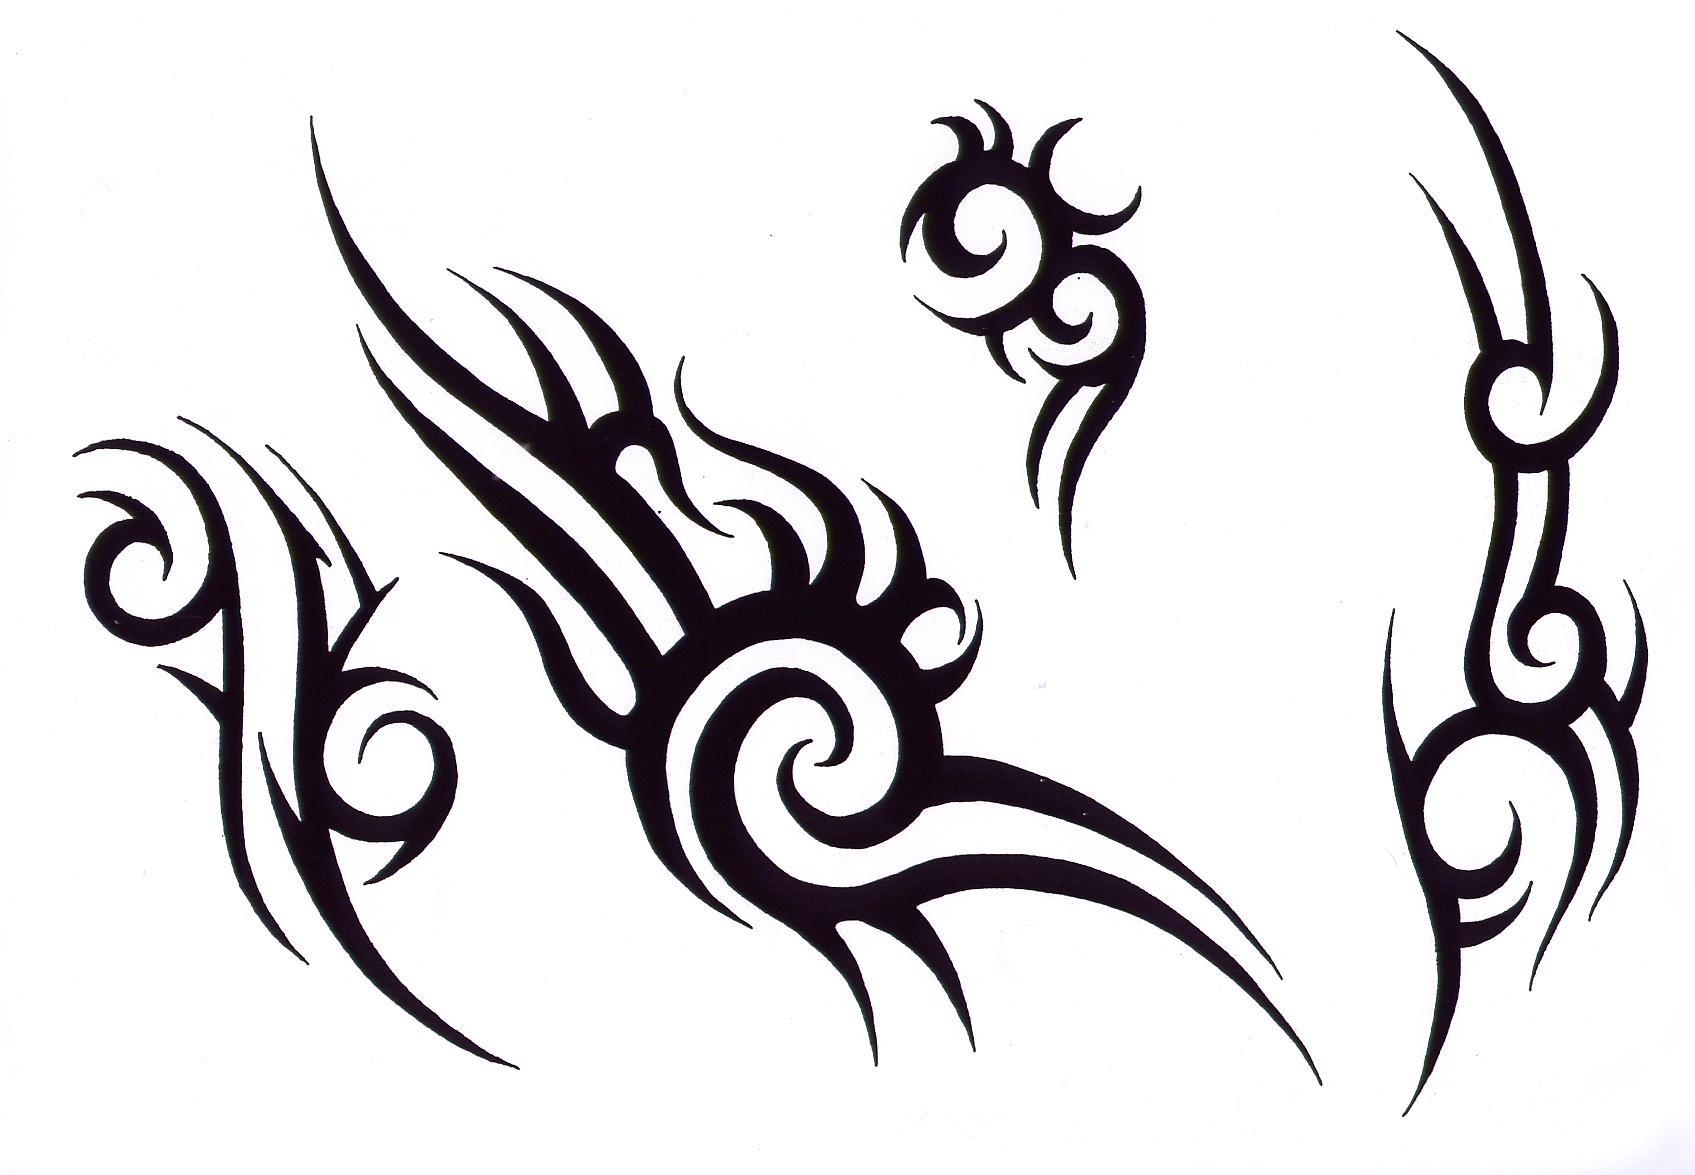 Rose outline vector image - Tribal Tattoo Desing Clipart Best